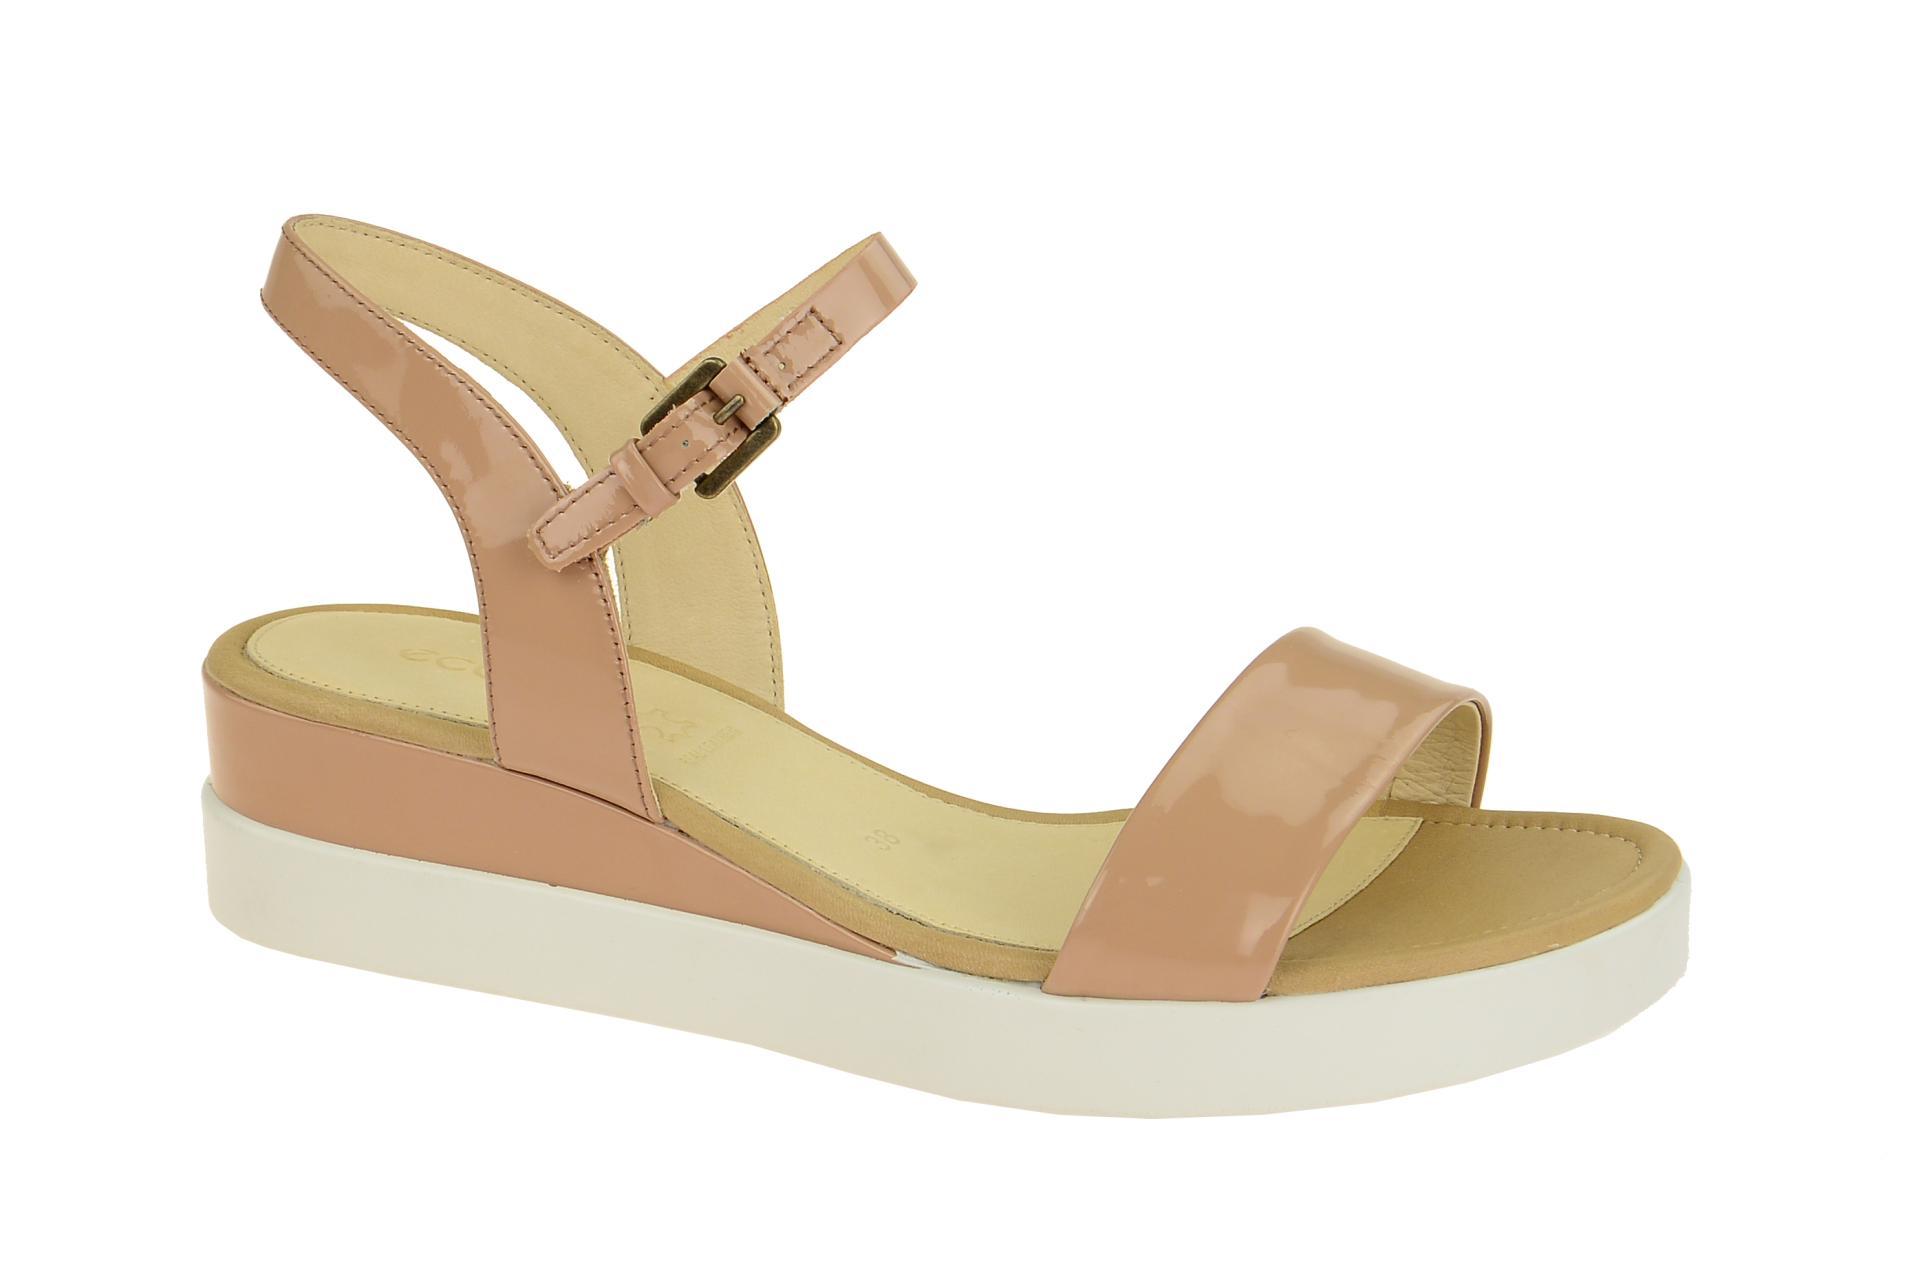 ecco schuhe touch beige damen sandalette riemchen sandalen. Black Bedroom Furniture Sets. Home Design Ideas